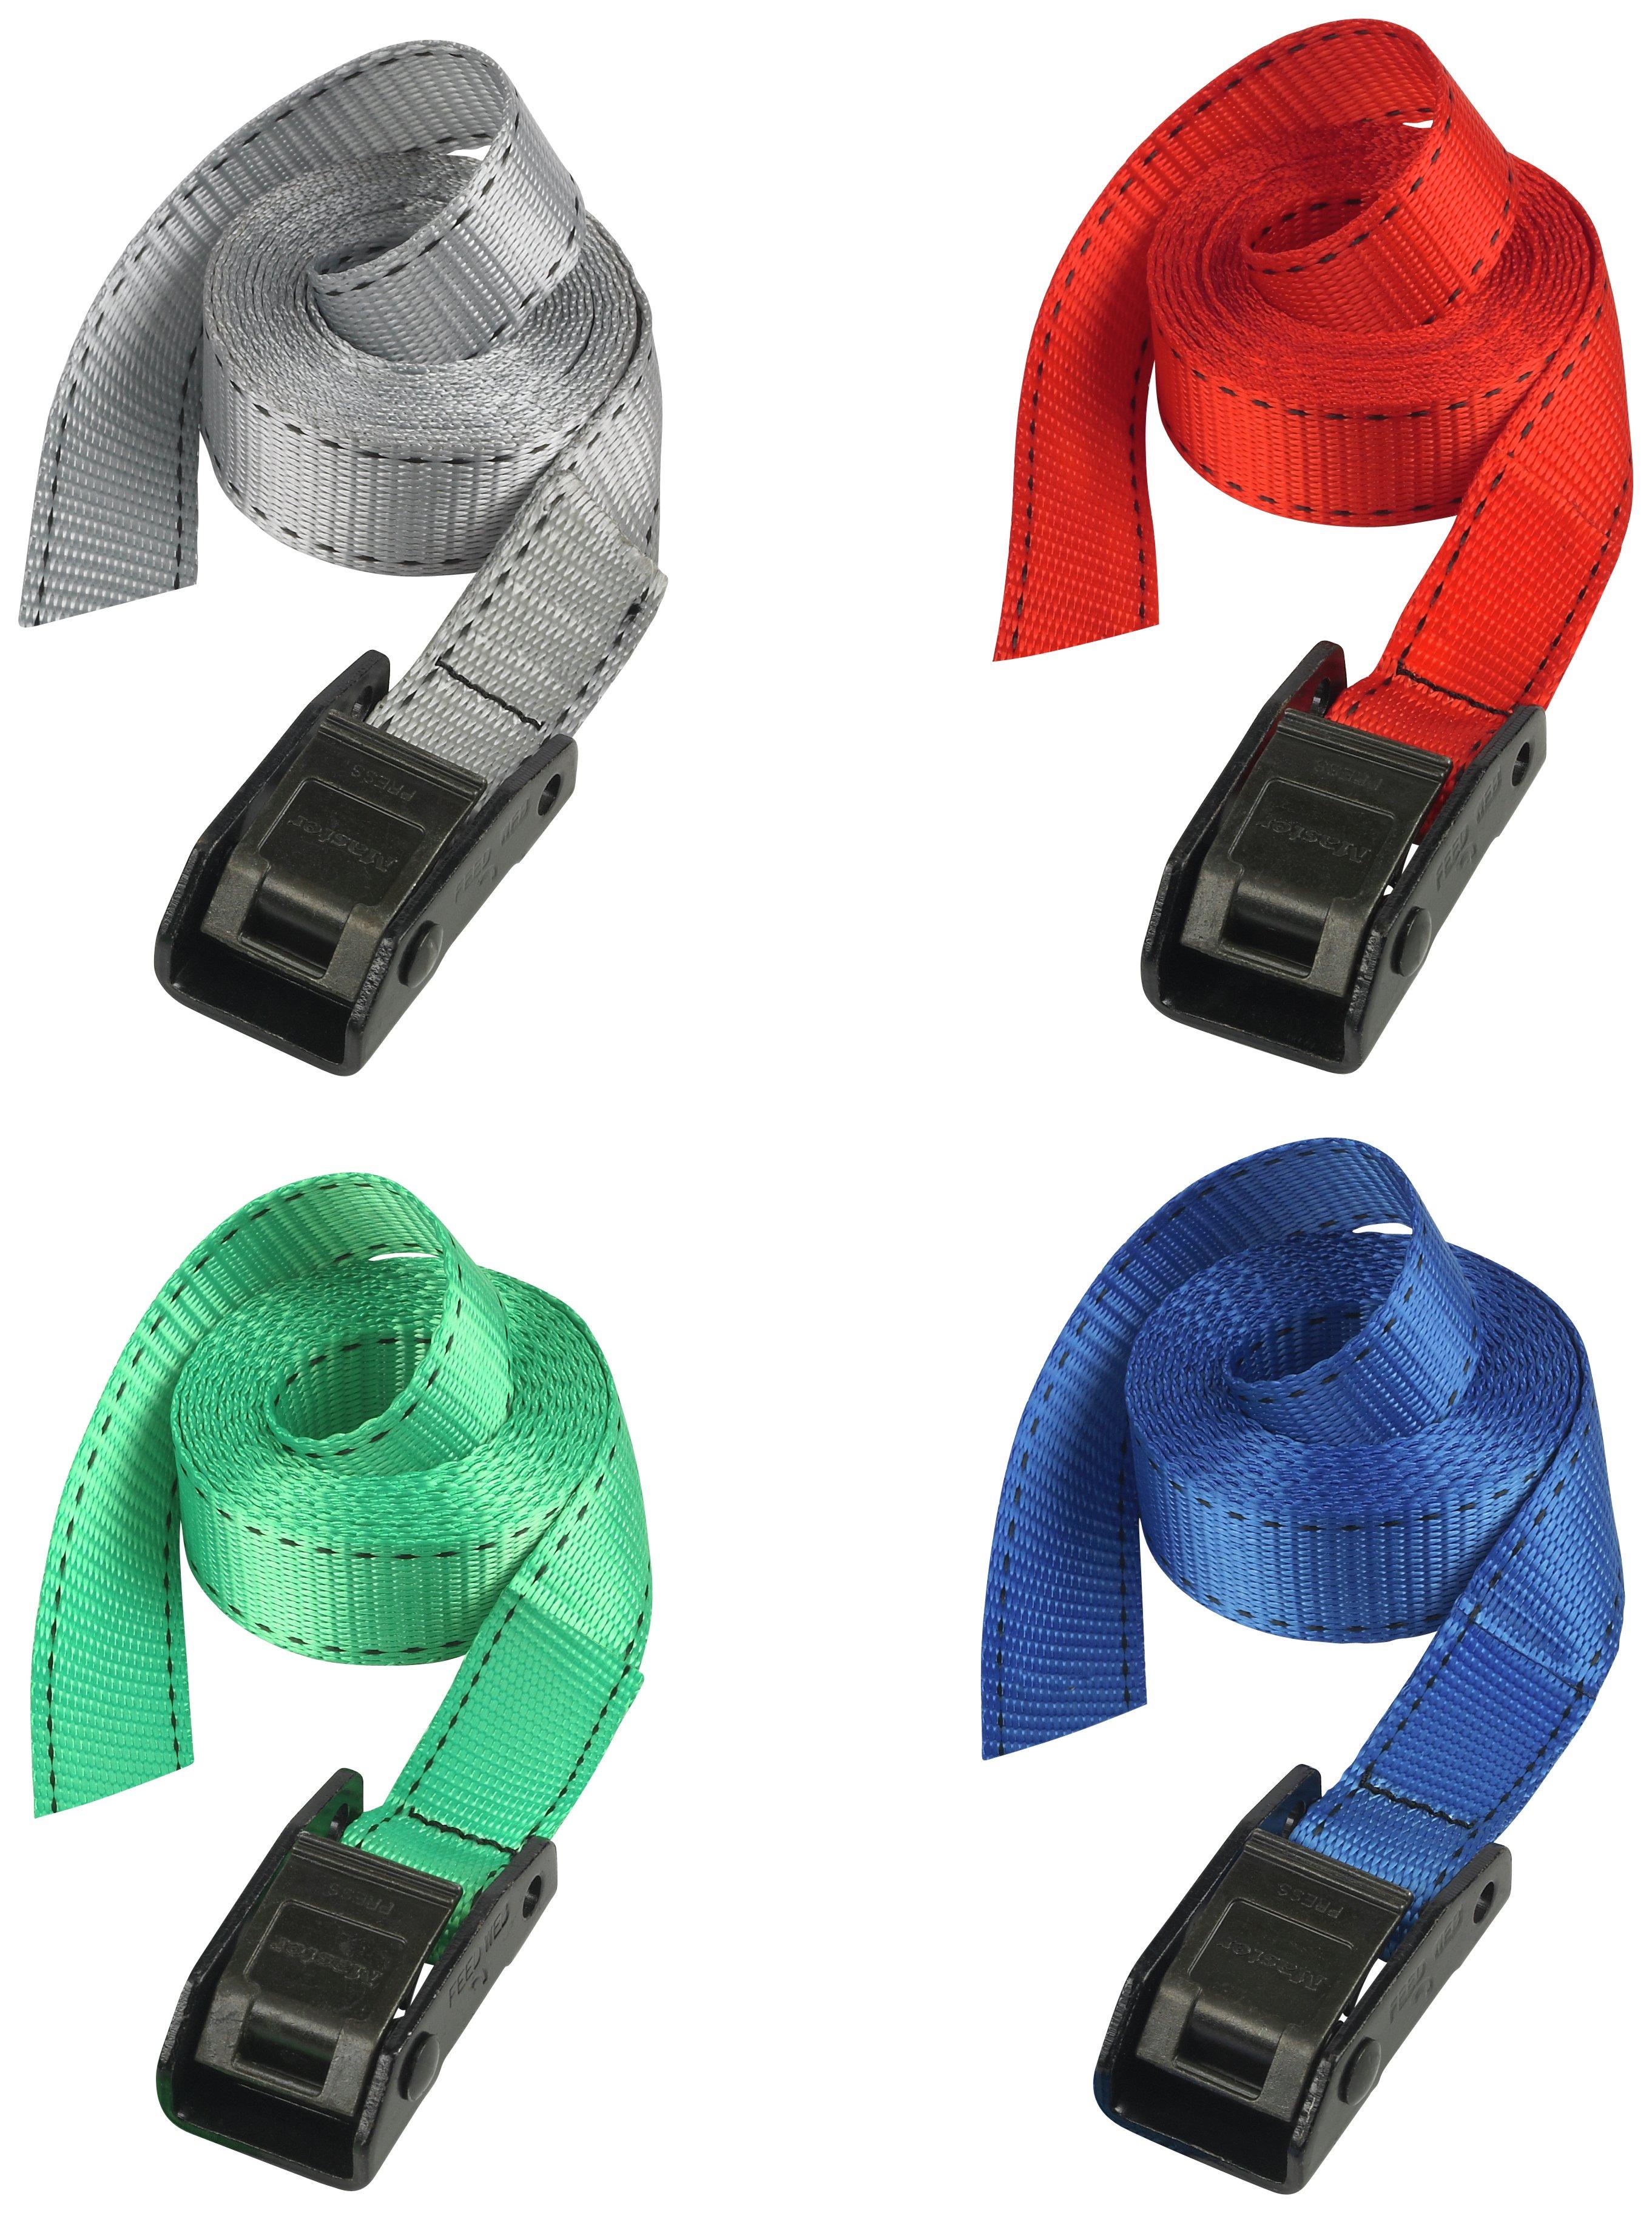 Master Lock 5m x 25mm Lashing Strap. lowest price